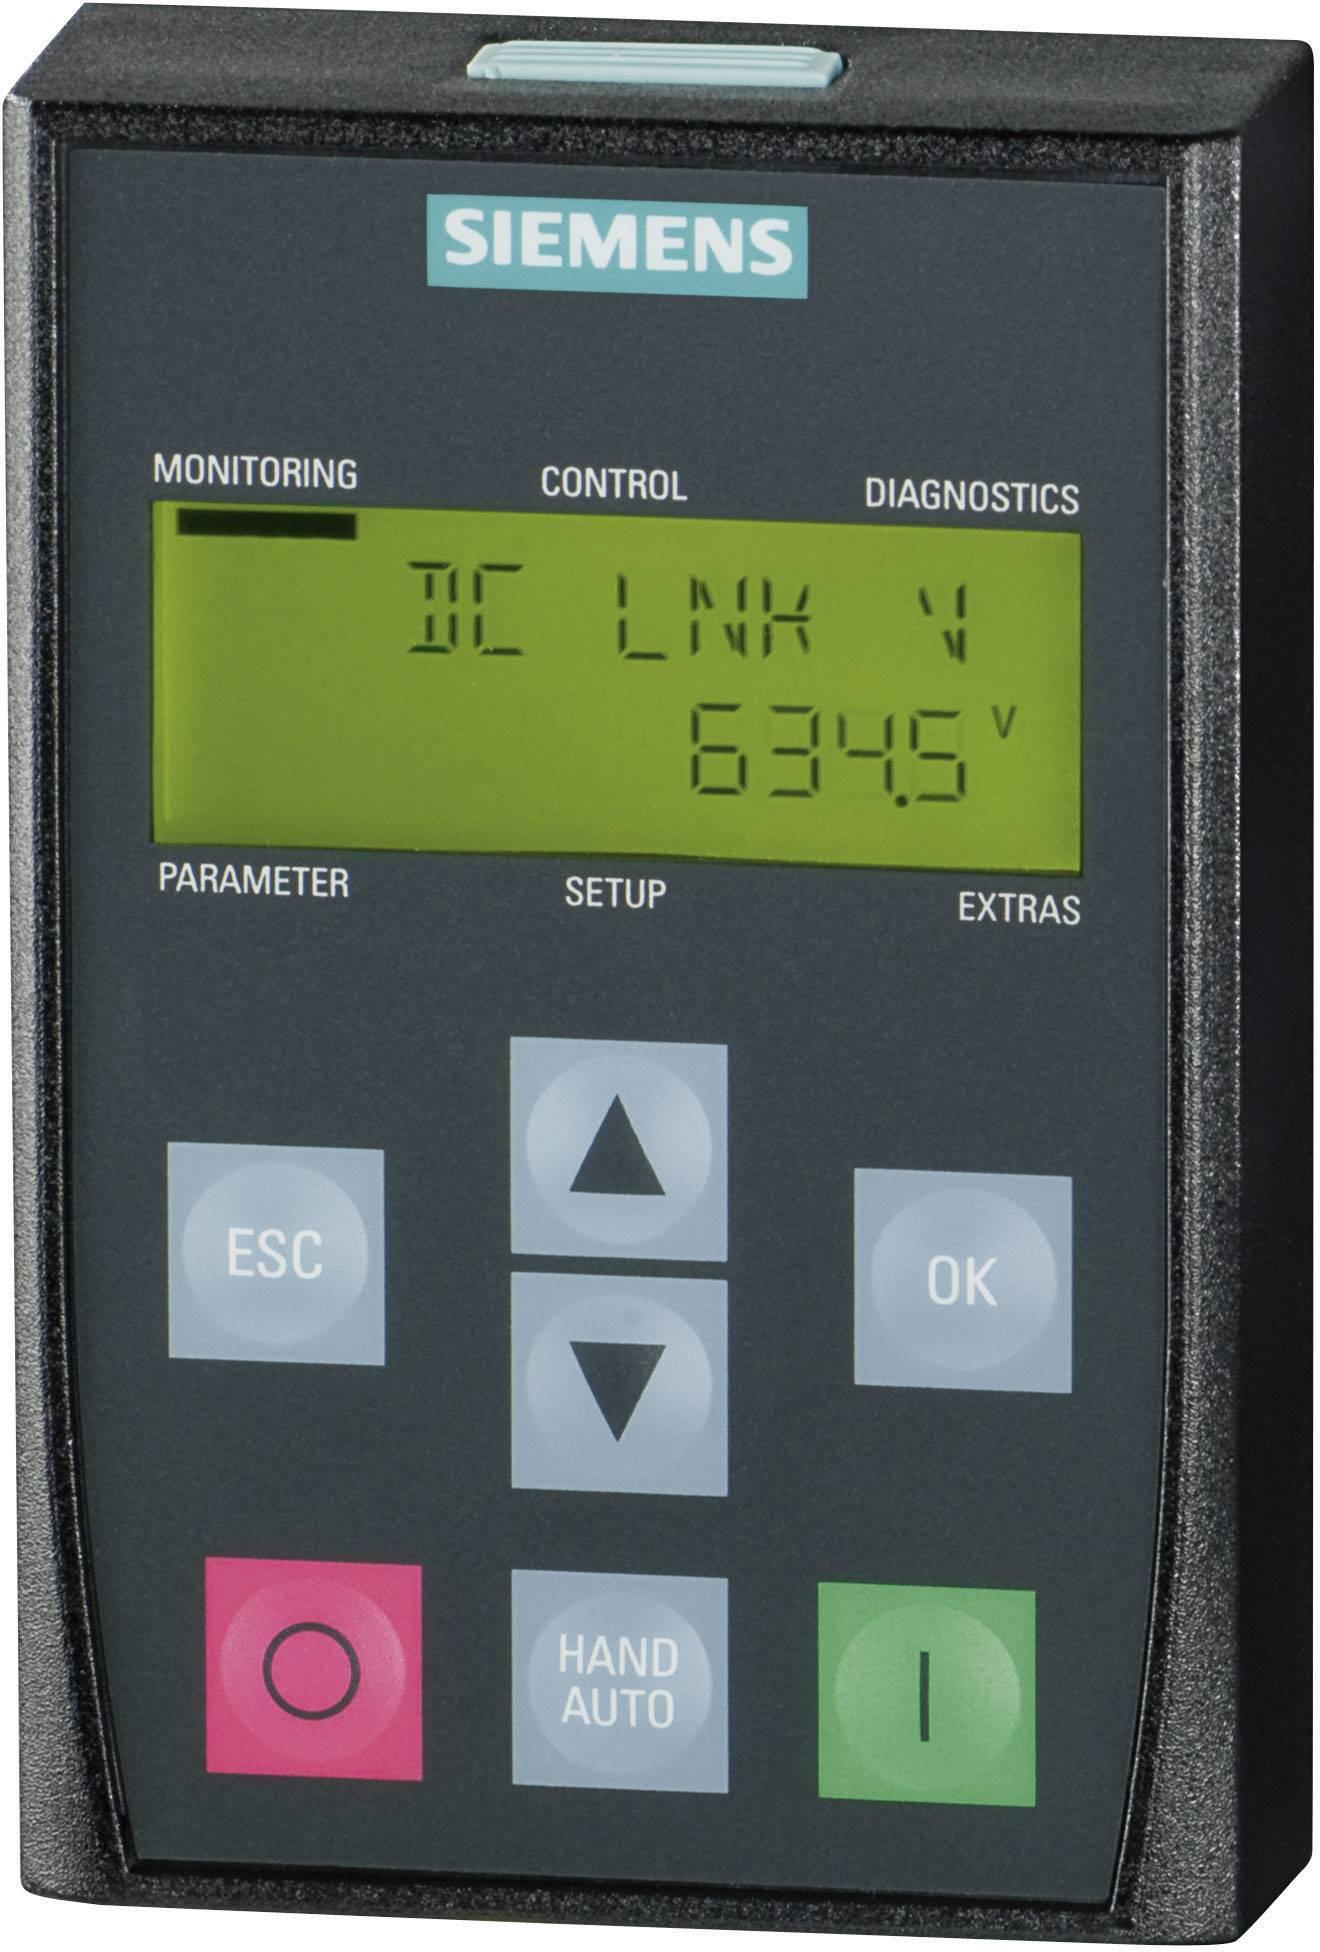 Obslužné pole Basic Operator Panel Siemens SINAMICS G120 BOP (6SL3255-0AA00-4CA1)